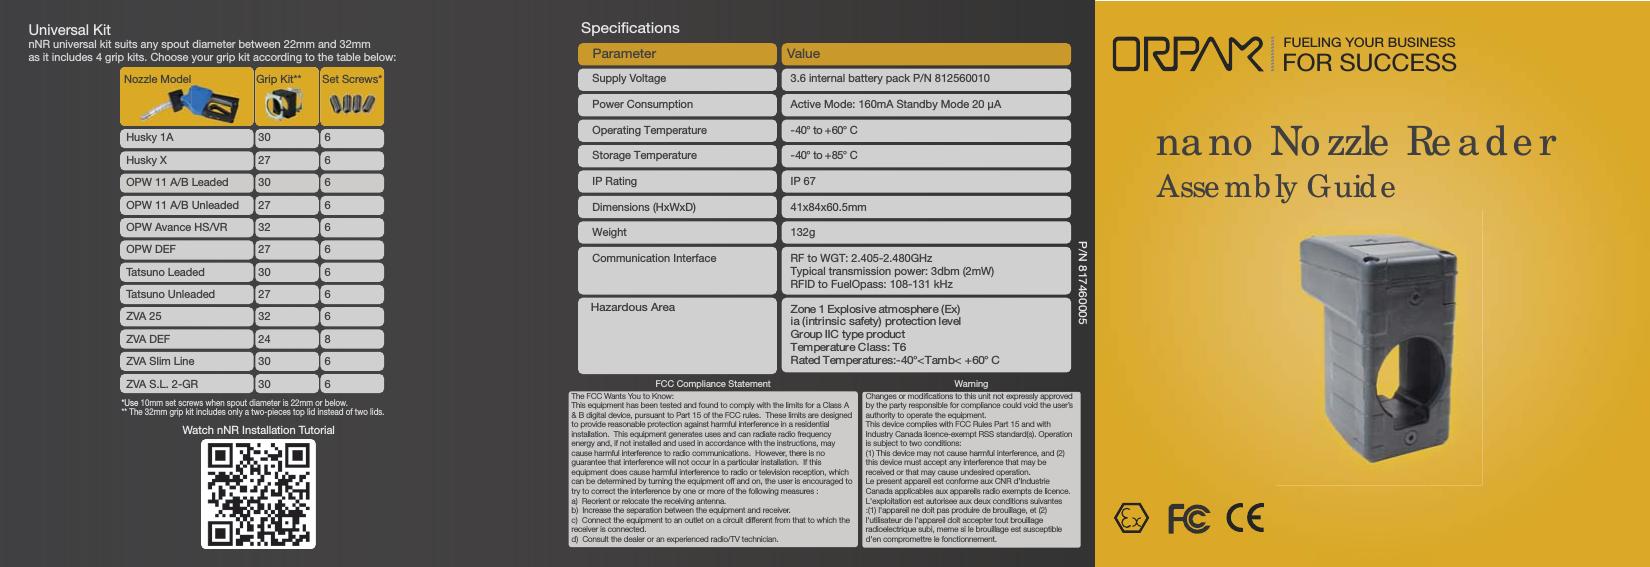 industry standards for user documentation